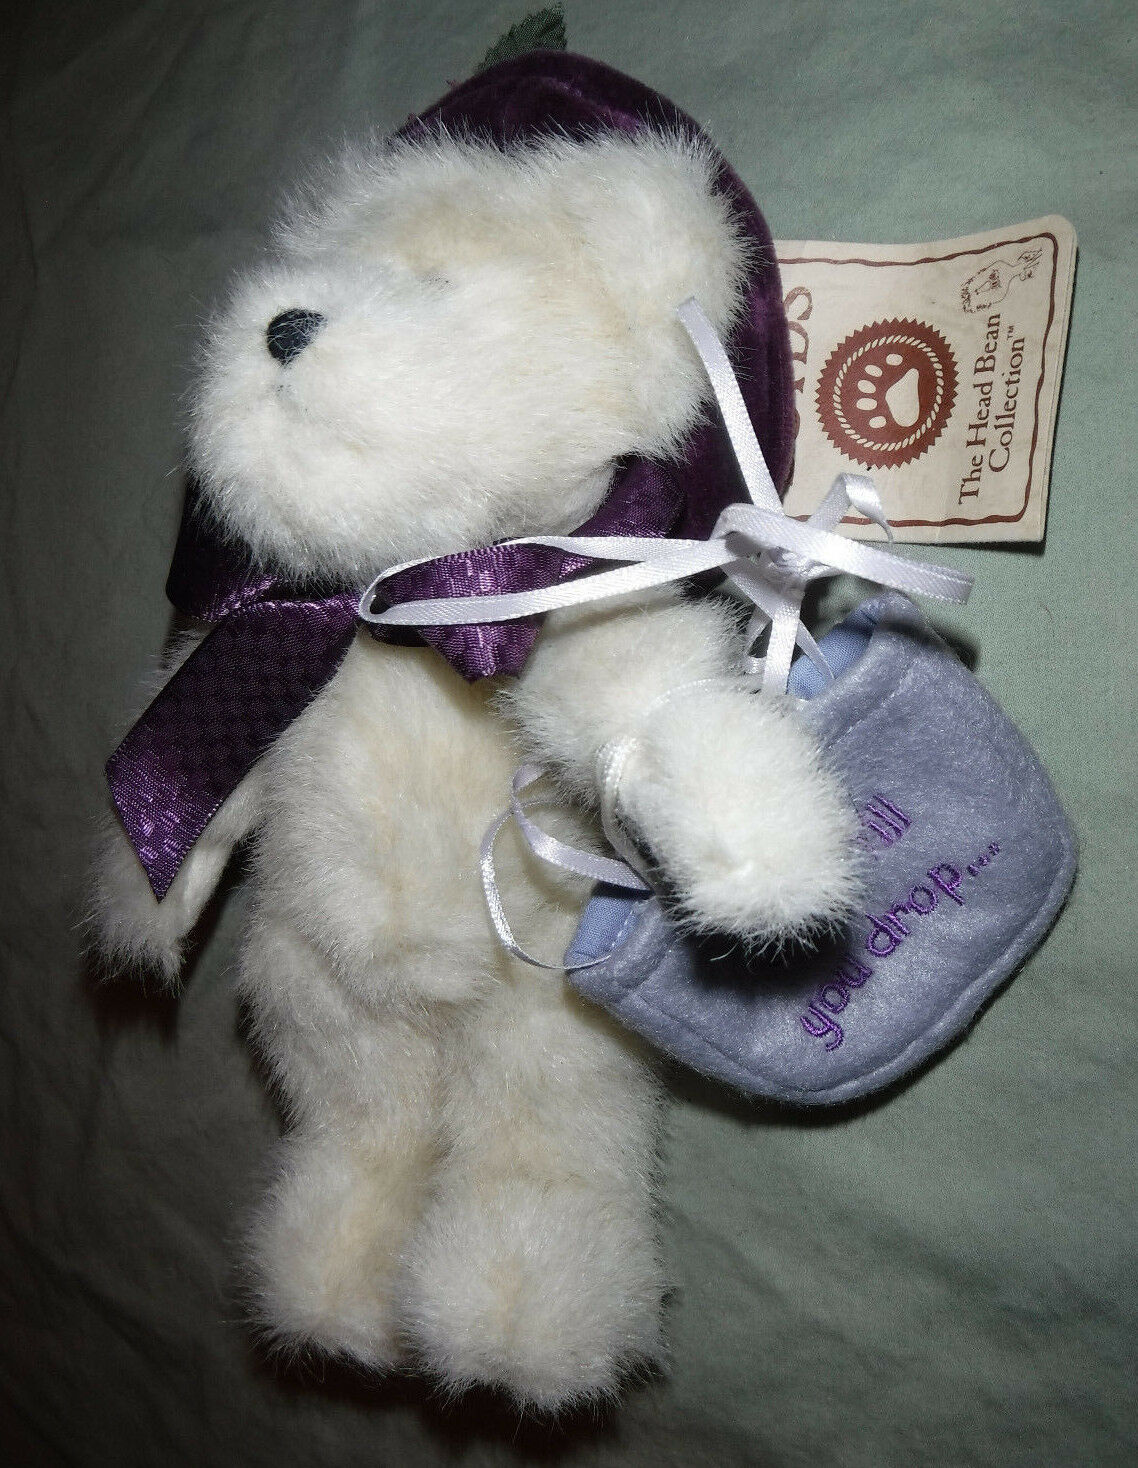 Ineeda Bargain Boyds Bear Shop to You Drop 9  Plush Soft Toy Stuffed Animal